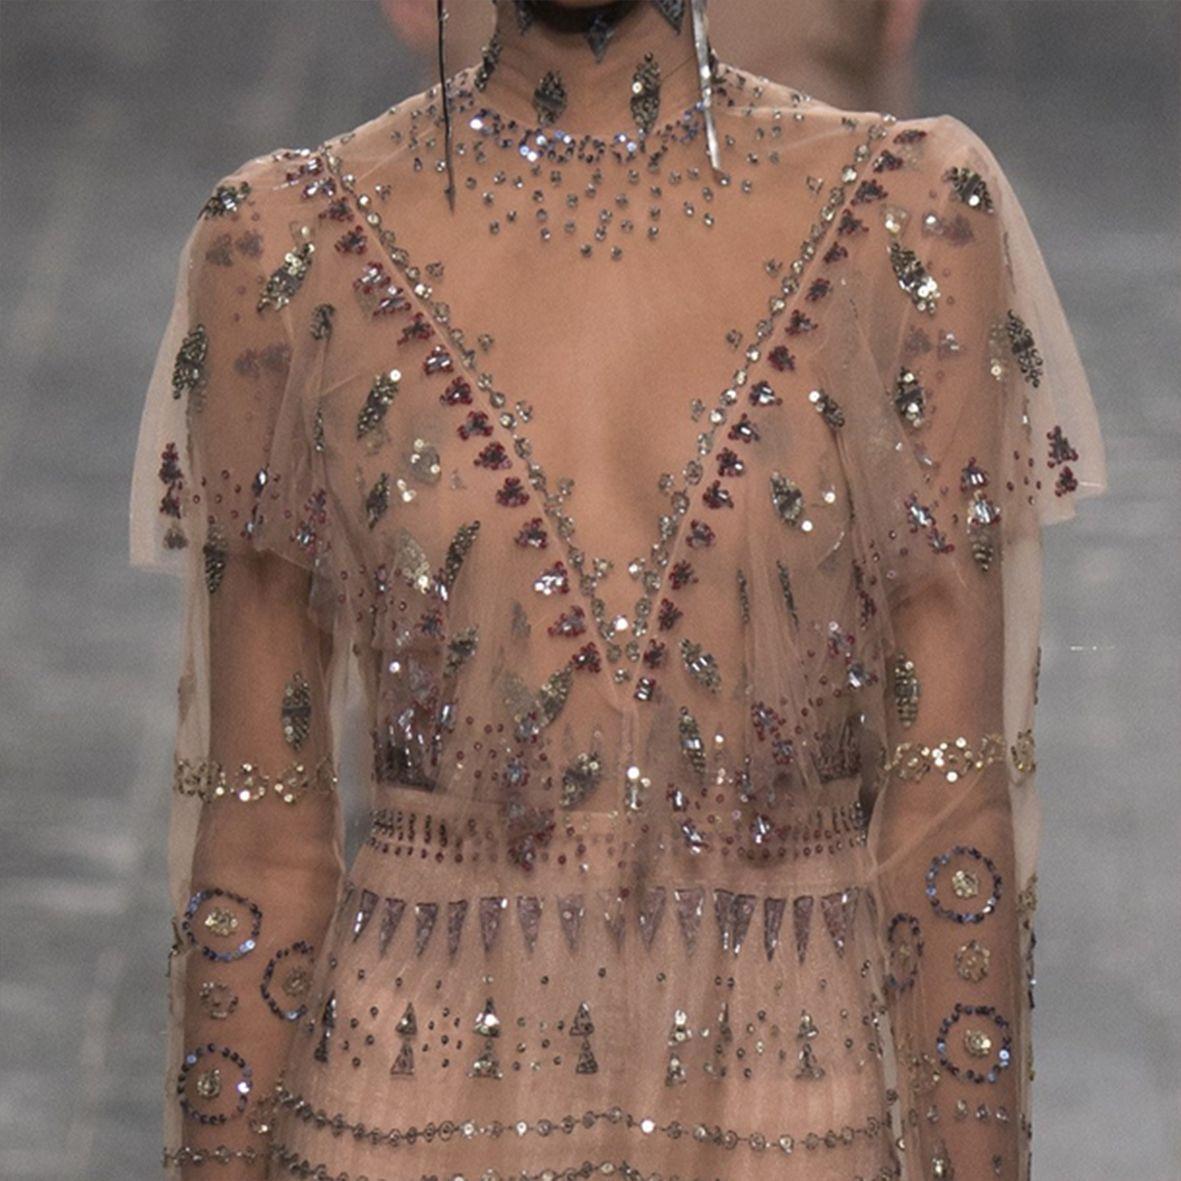 Valentino Fall 2016 Ready to Wear